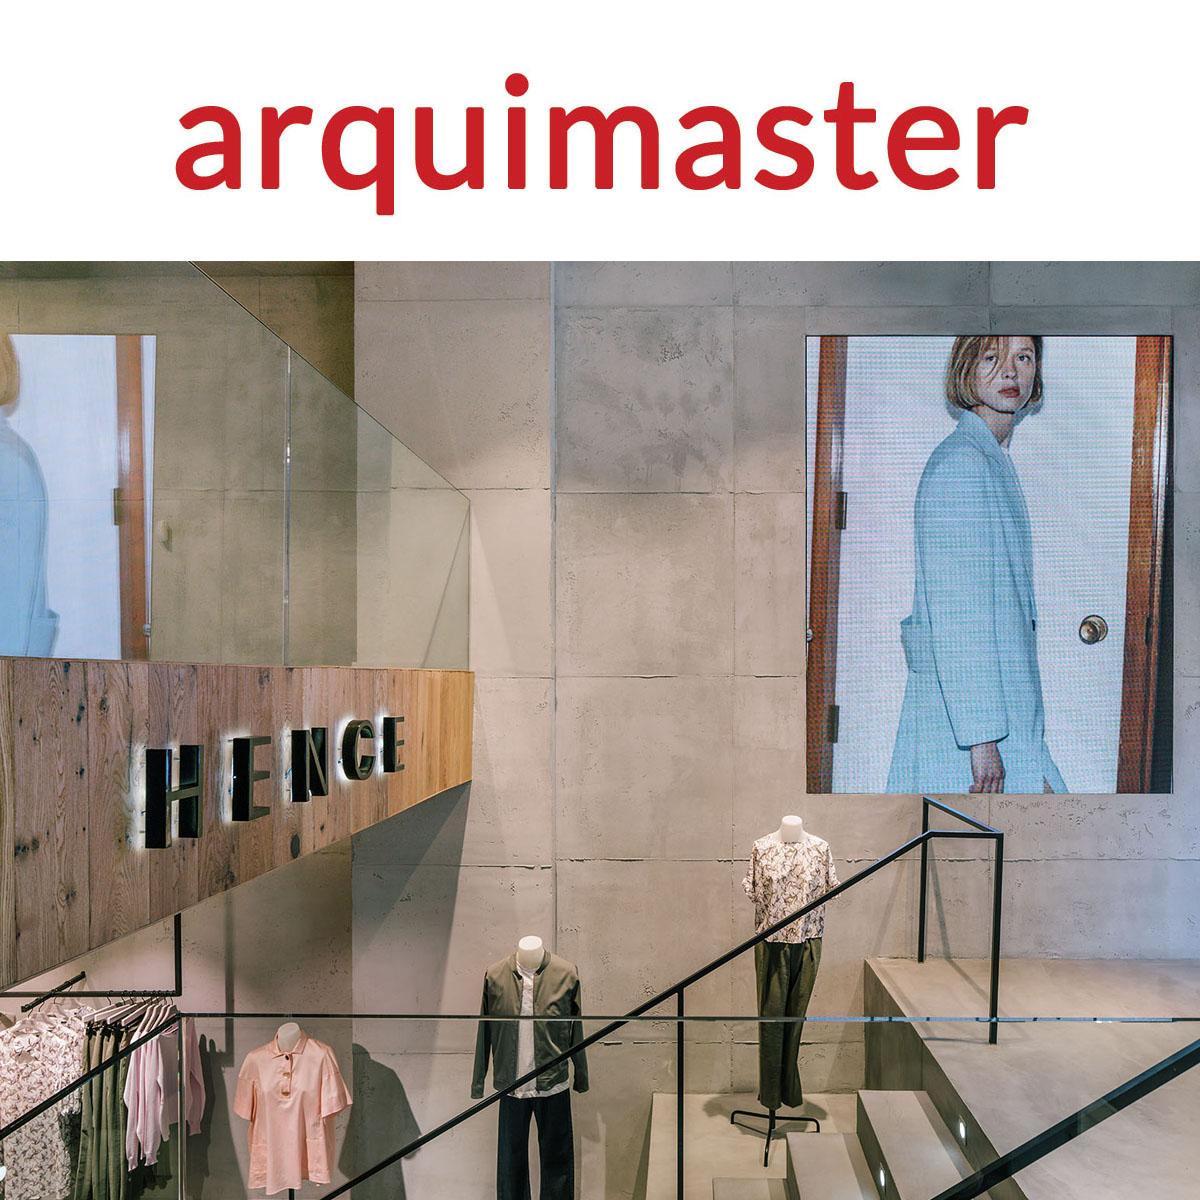 Arquimaster